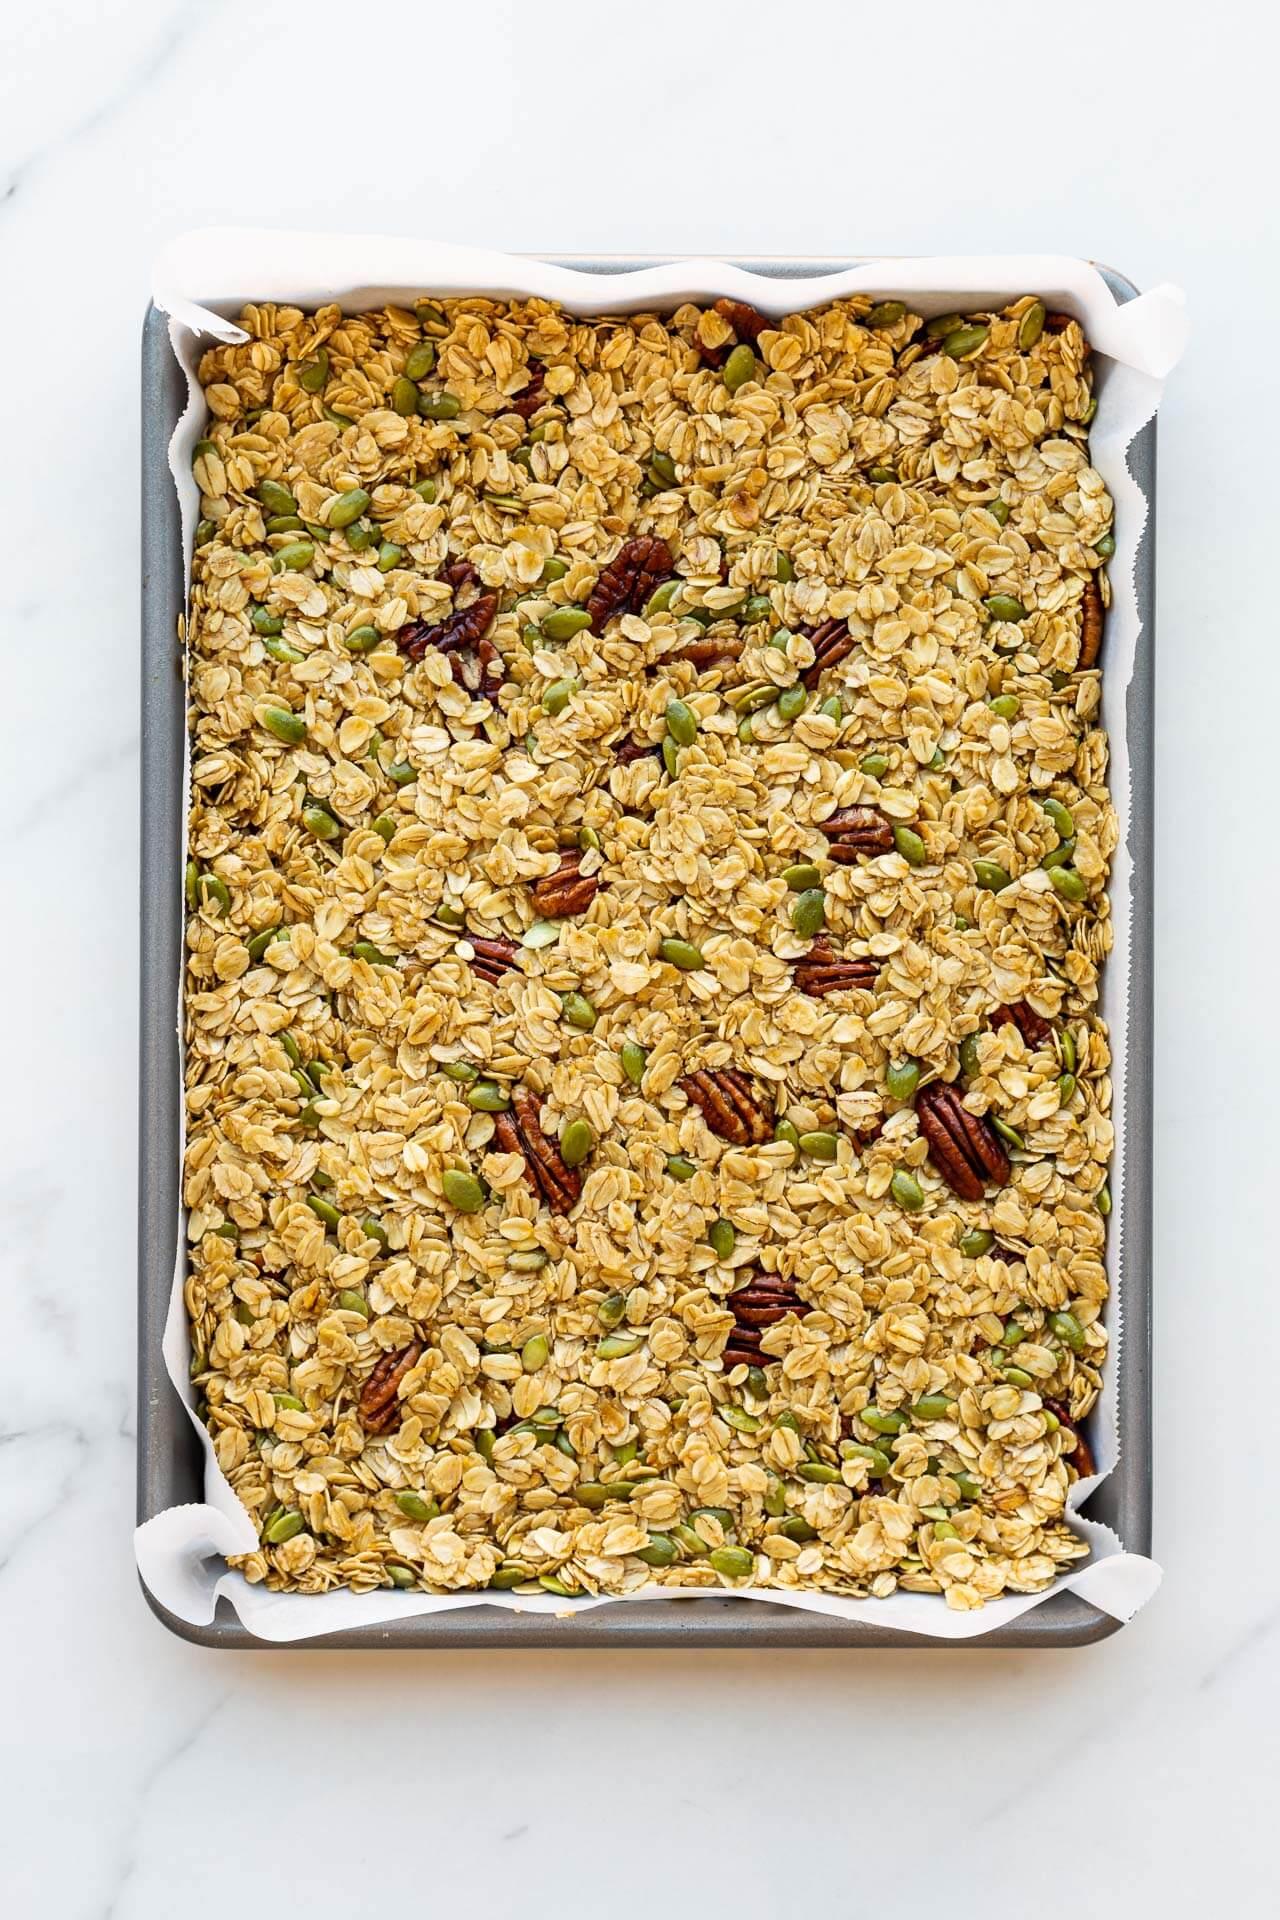 Granola mixture pressed in a sheet pan